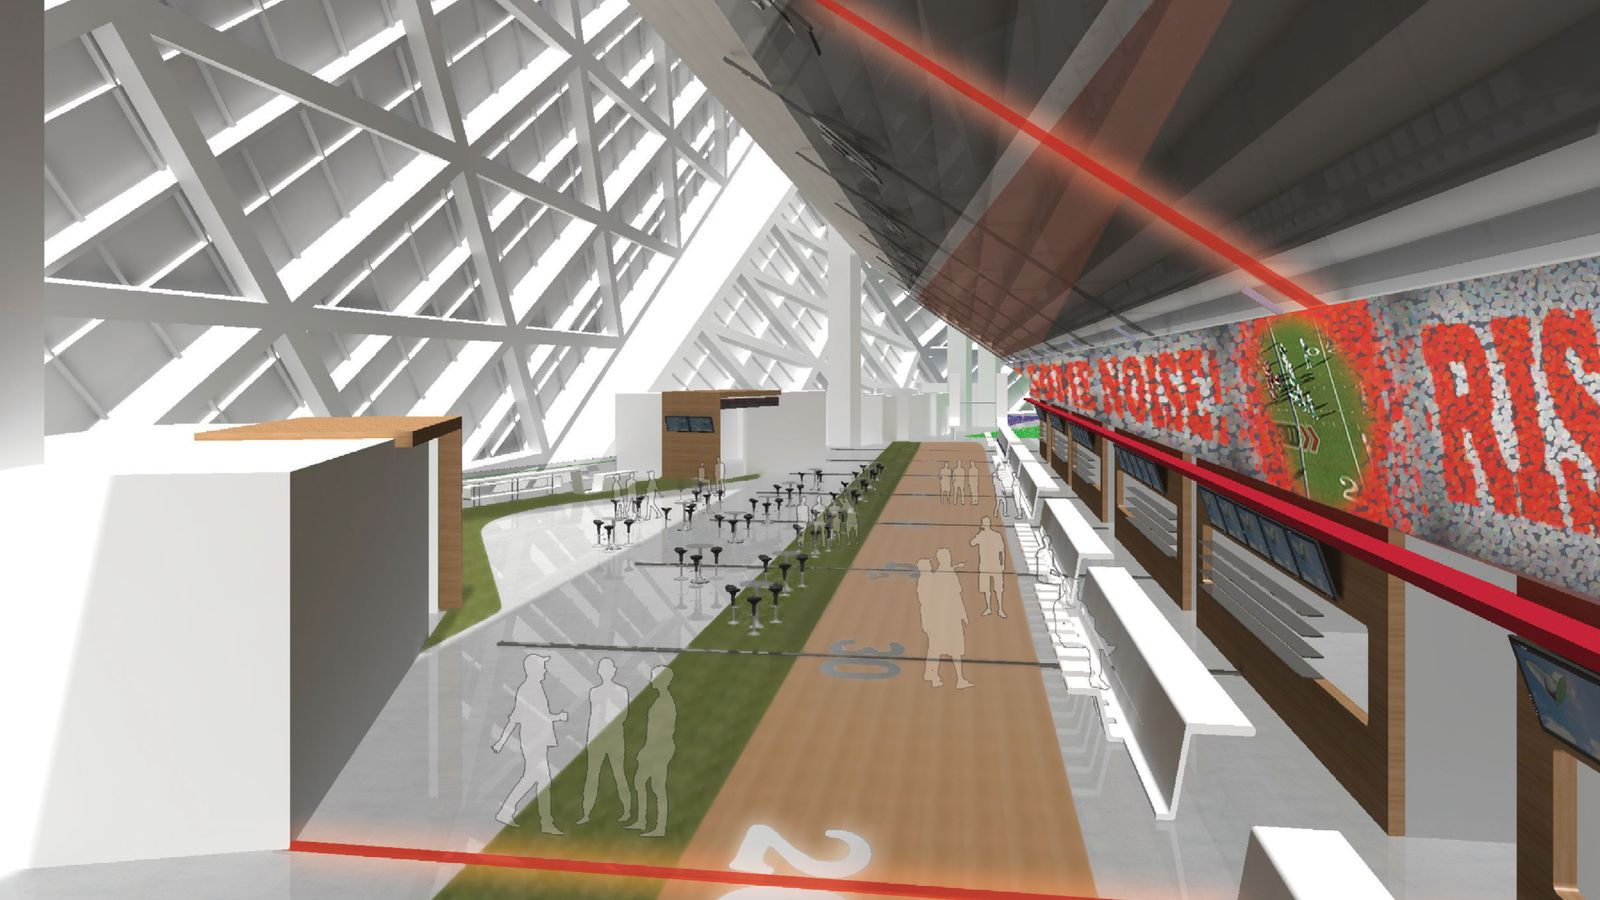 new_falcons_stadium219.jpg